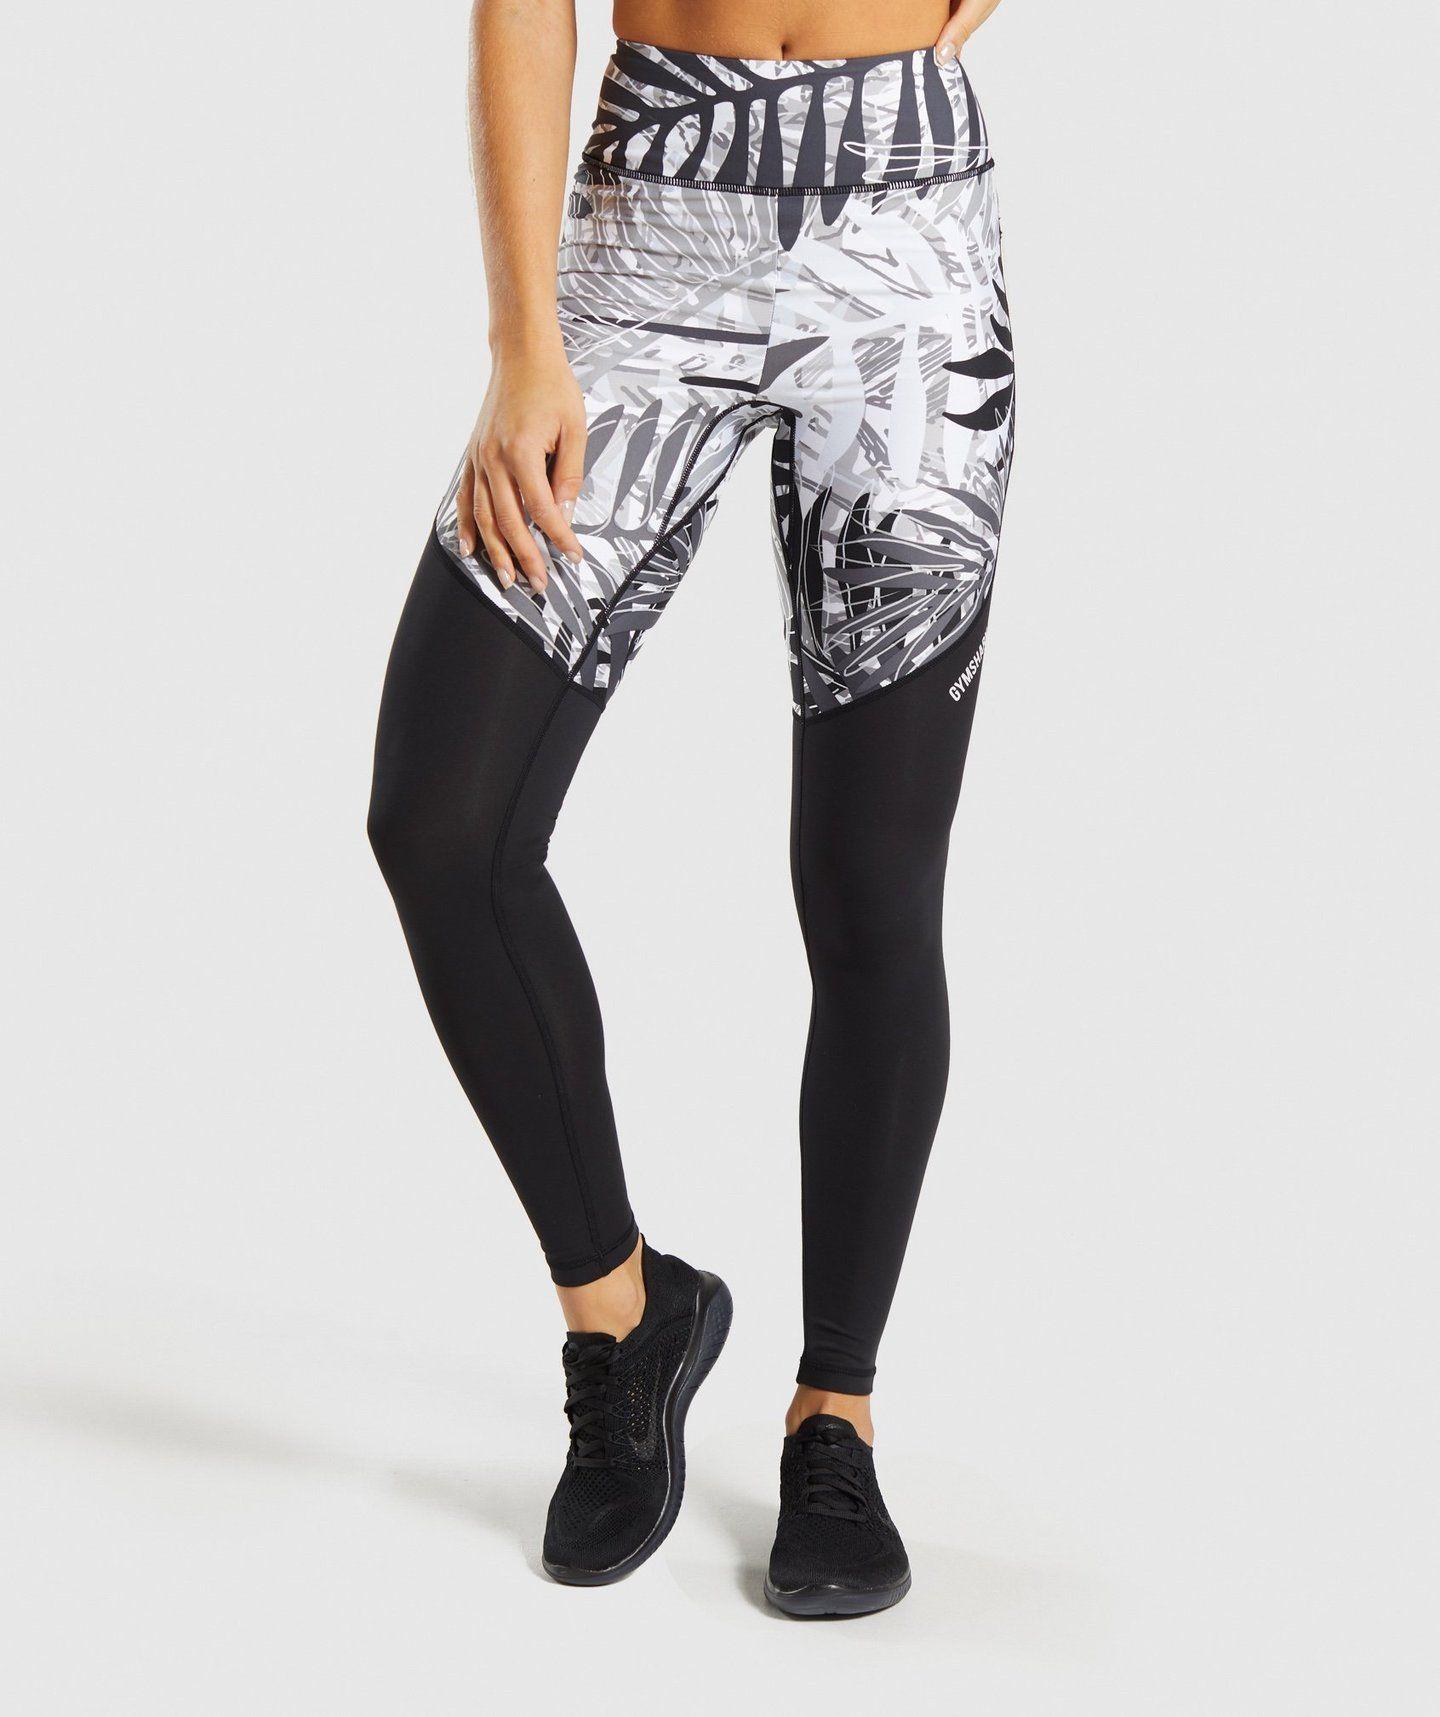 bc2836bbe7f5be Gymshark Paradise Leggings - Black/White in 2019 | Clothing | Black ...